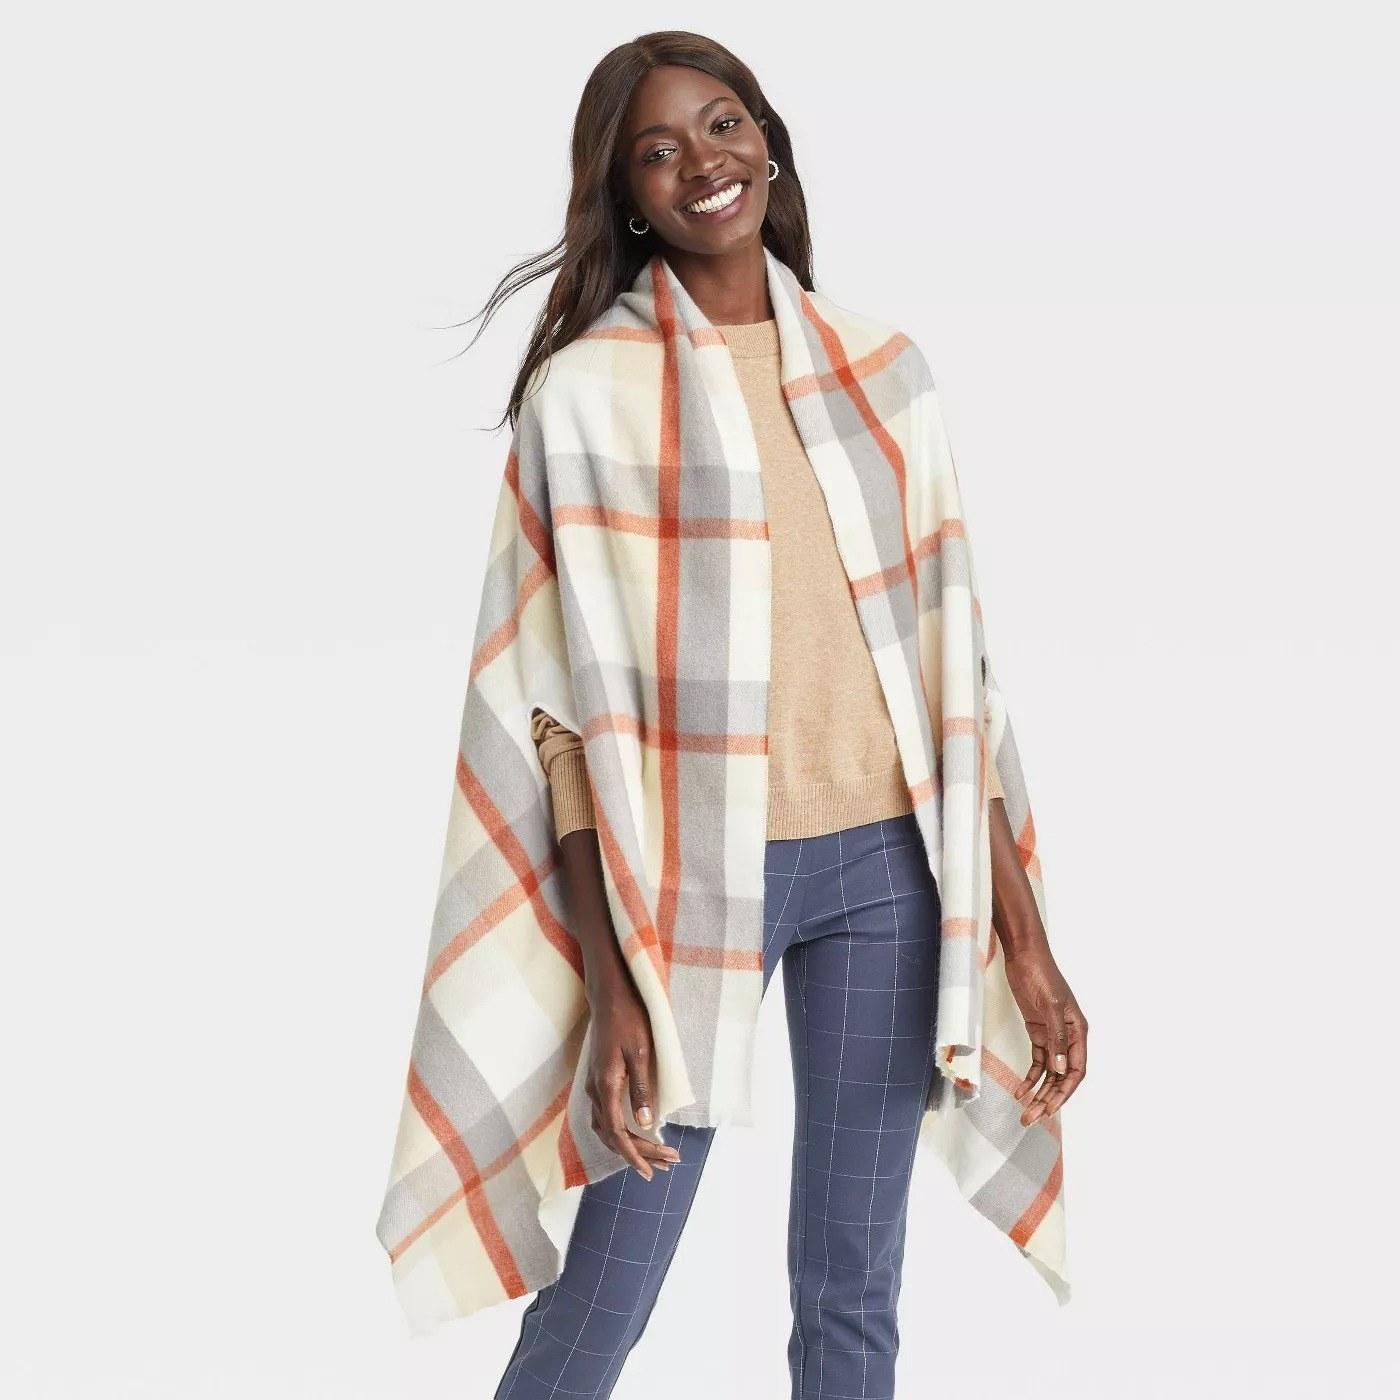 Model wearing gray, orange, and white striped open jacket